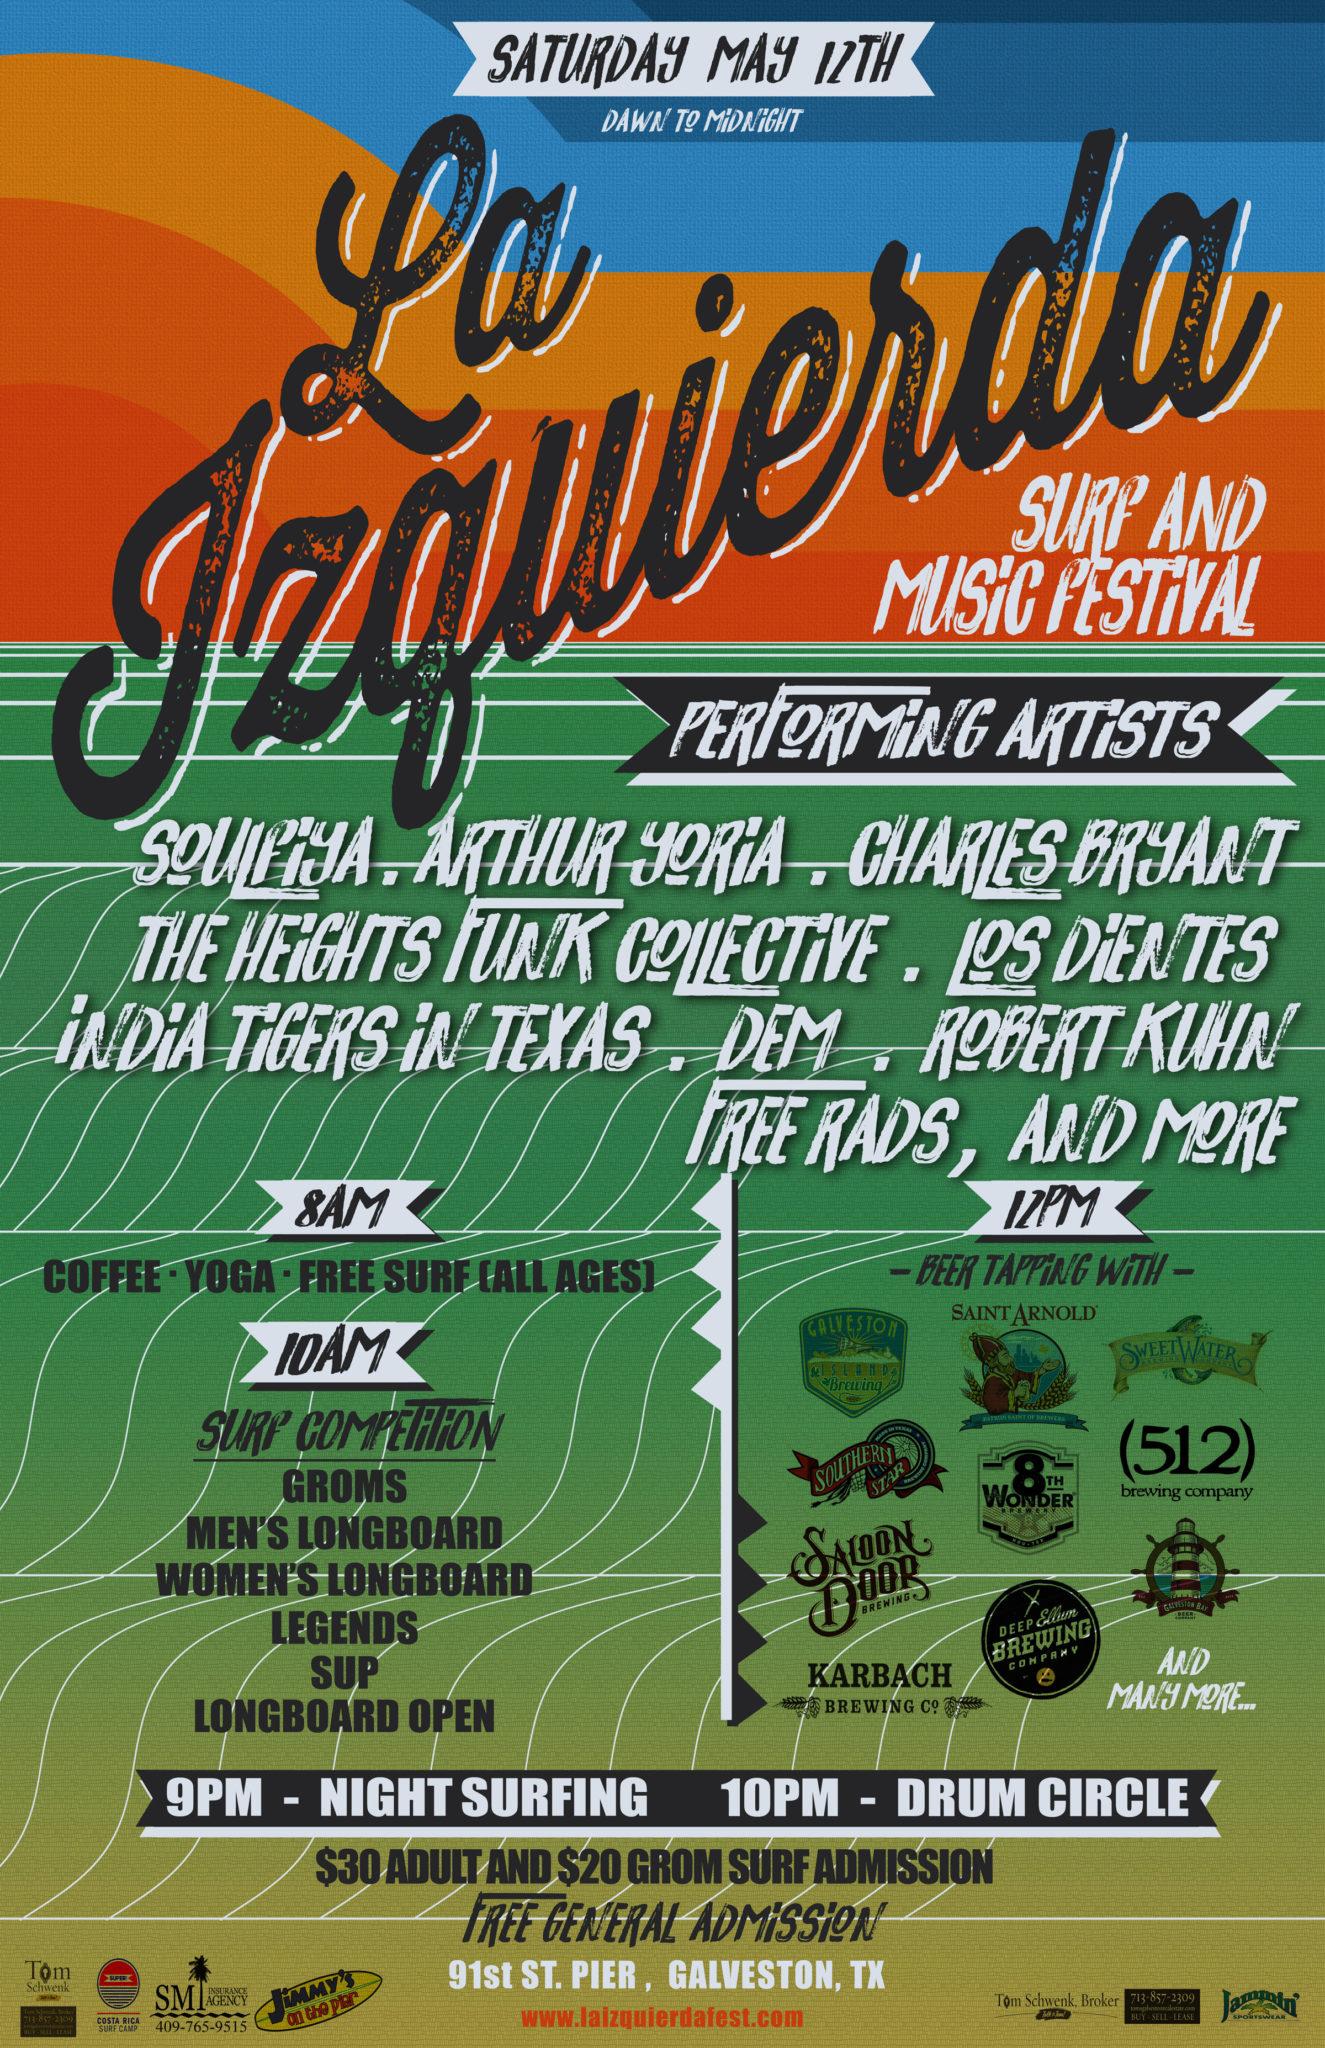 Flier 1.0 La Izquierda Surf and Music Festival